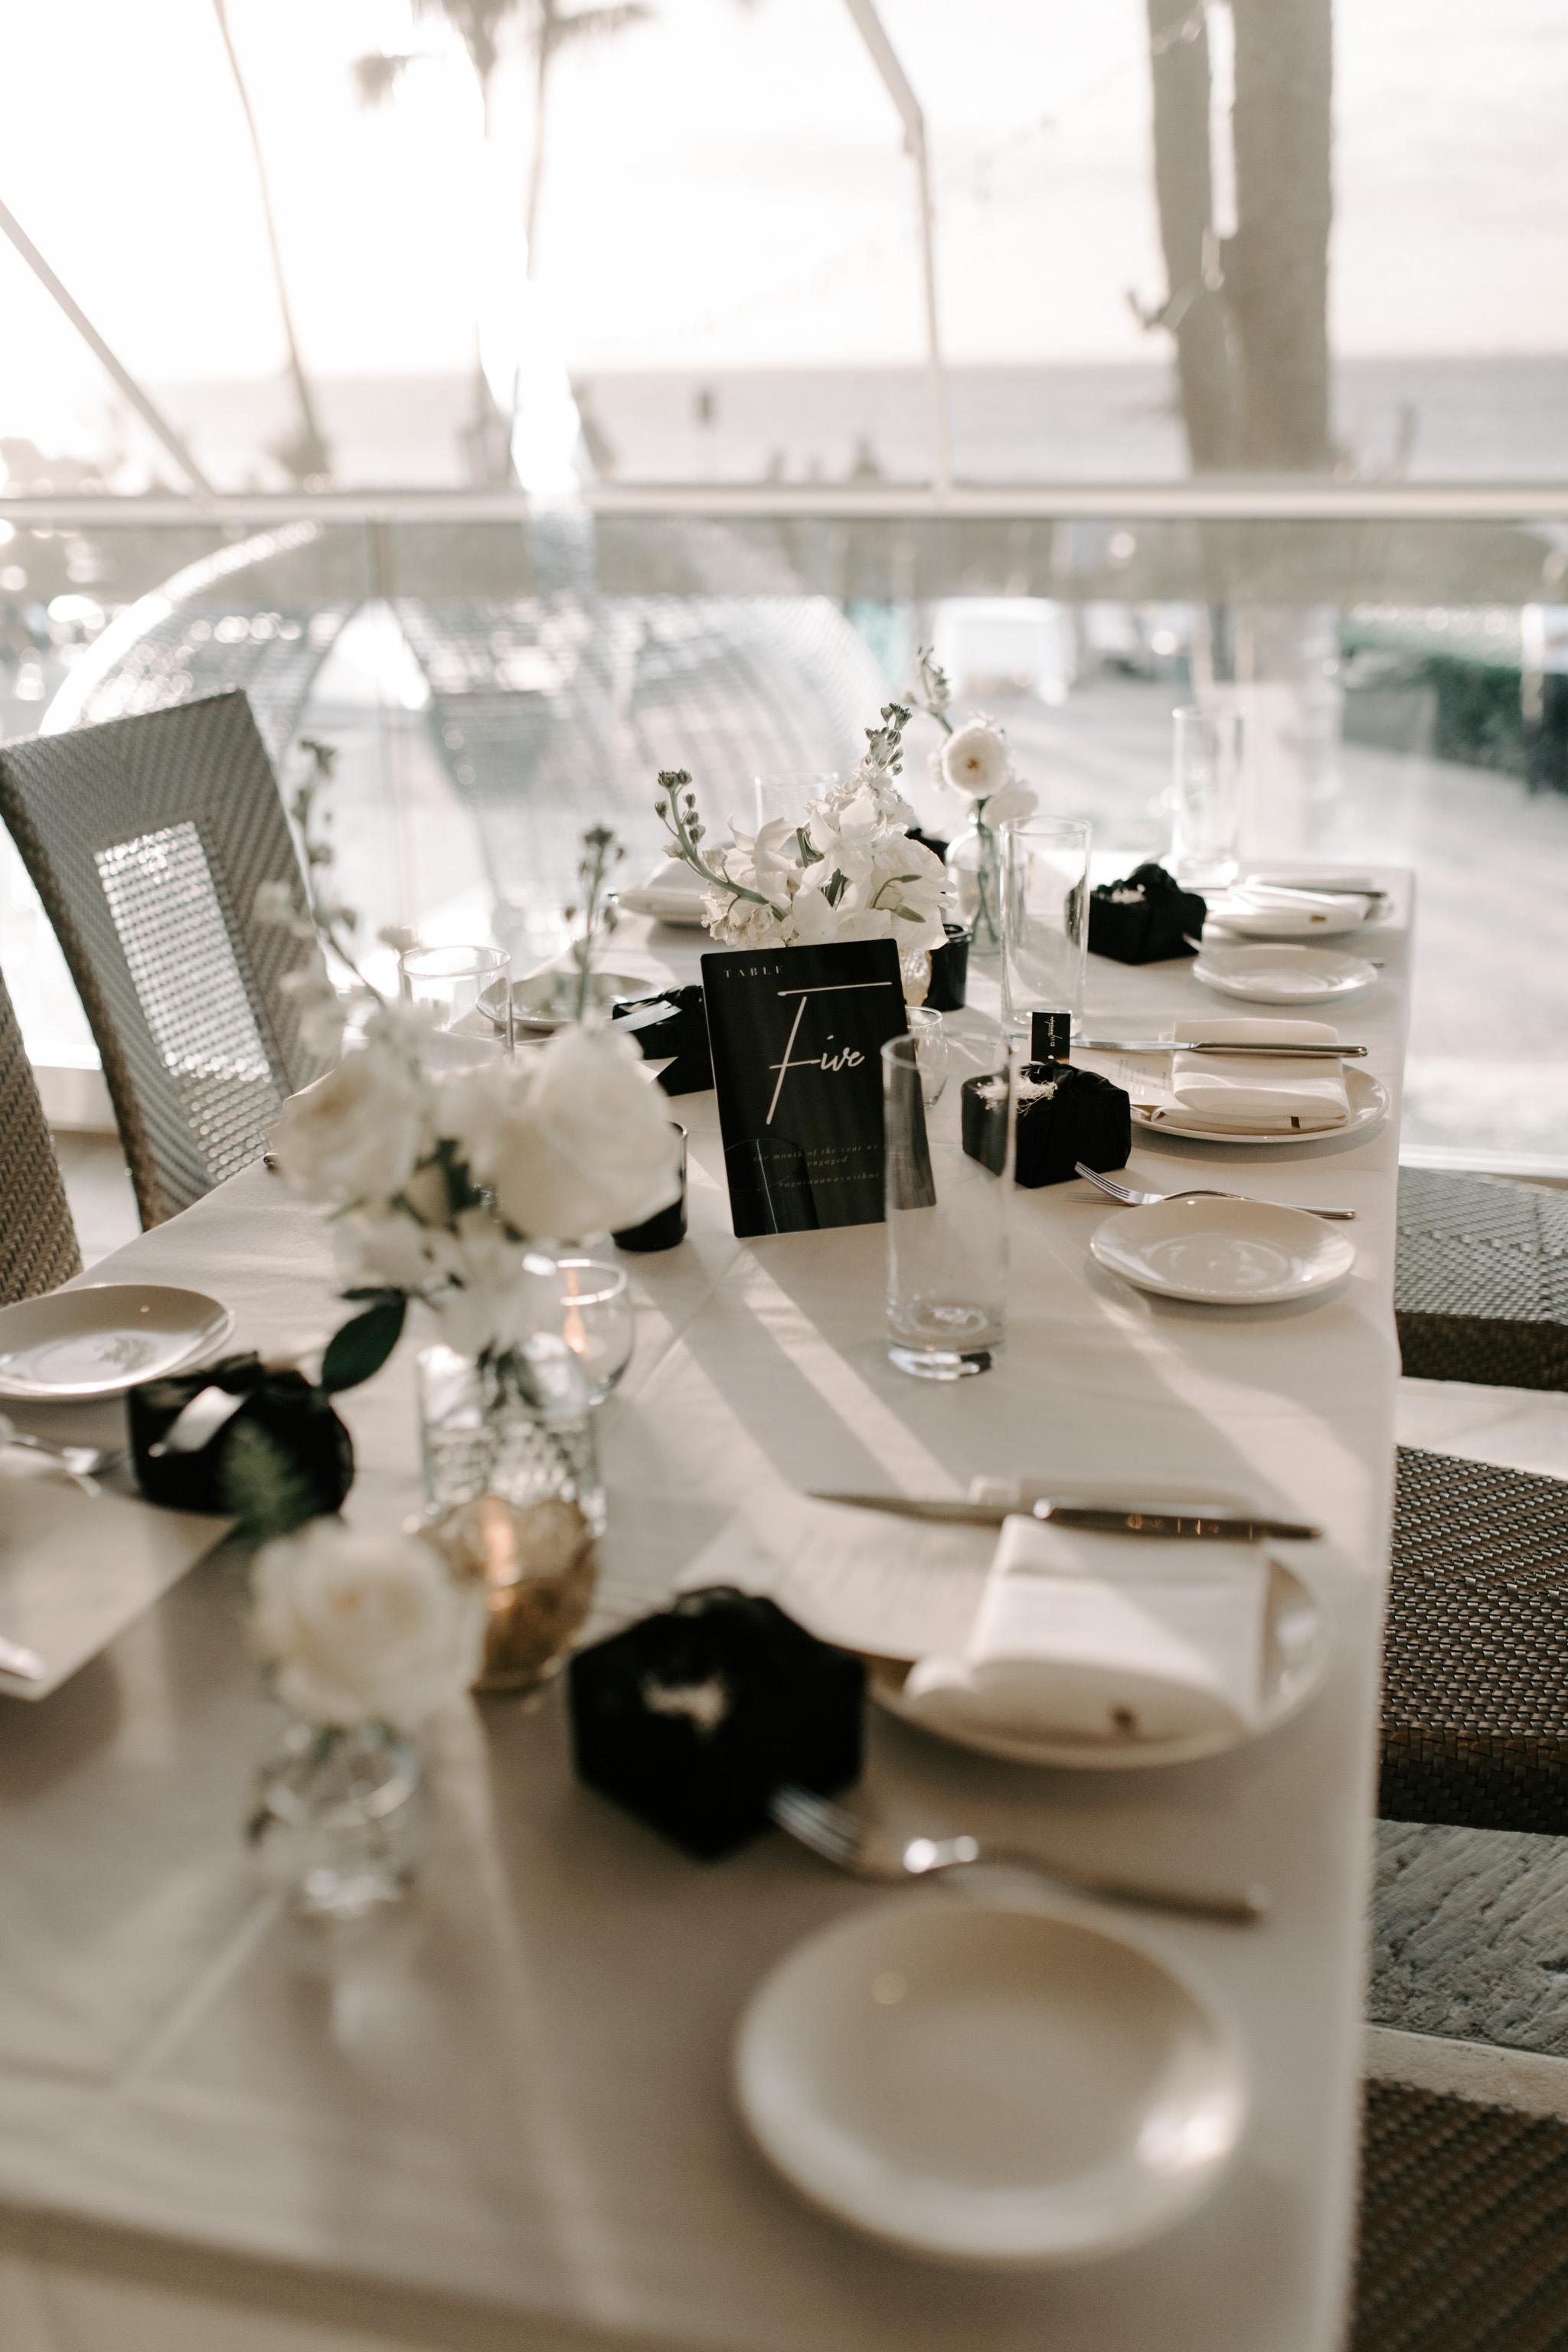 Beautiful wedding reception tablescape   Merriman's Kapalua Maui wedding by Hawaii wedding photographer Desiree Leilani